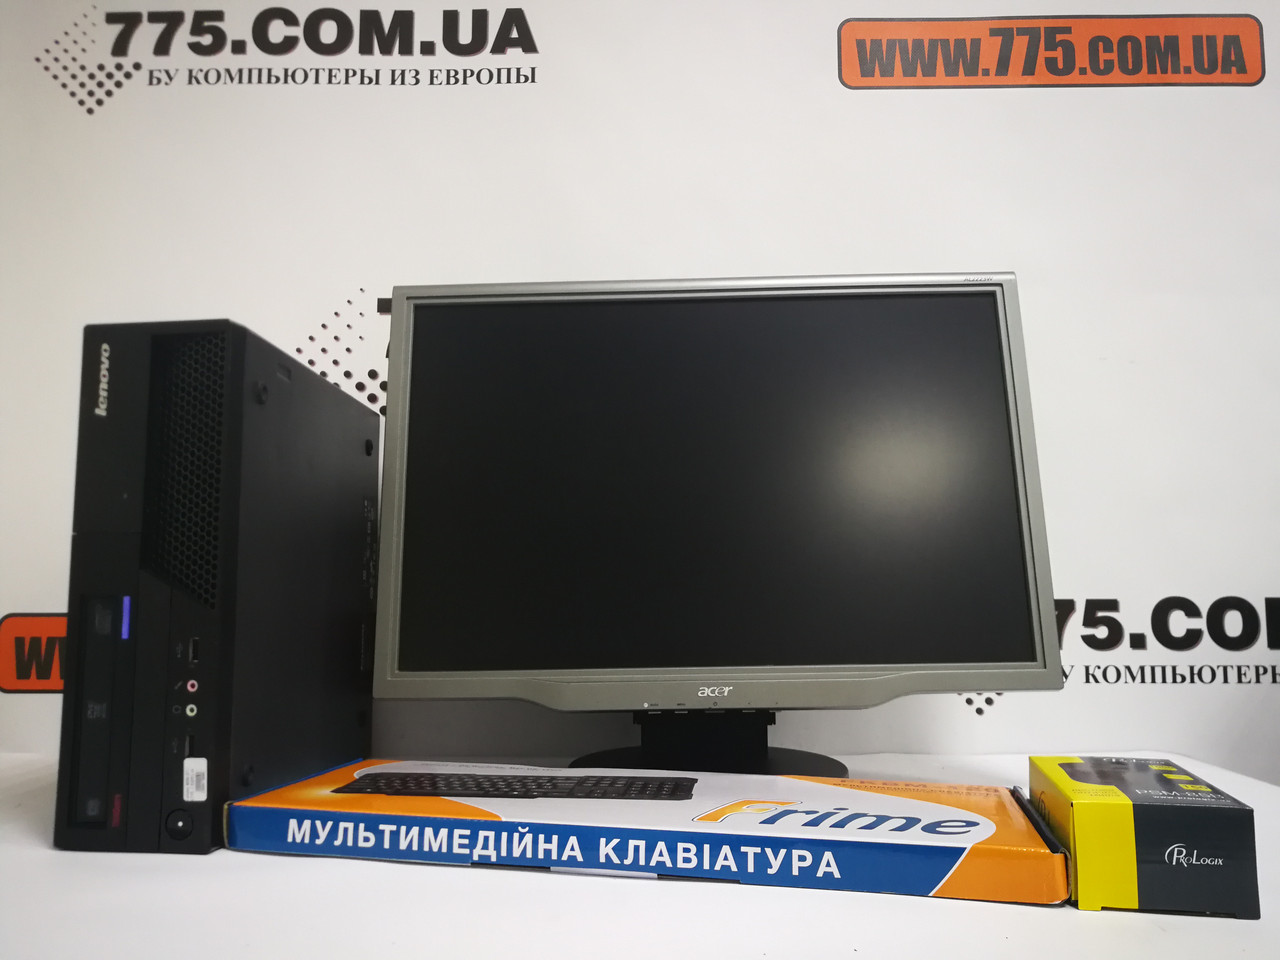 "Комплект, двухъядерный компьютер Intel 3.16ГГц + SSD, Монитор 22"" (1680х1050), клавиатура, мышь"